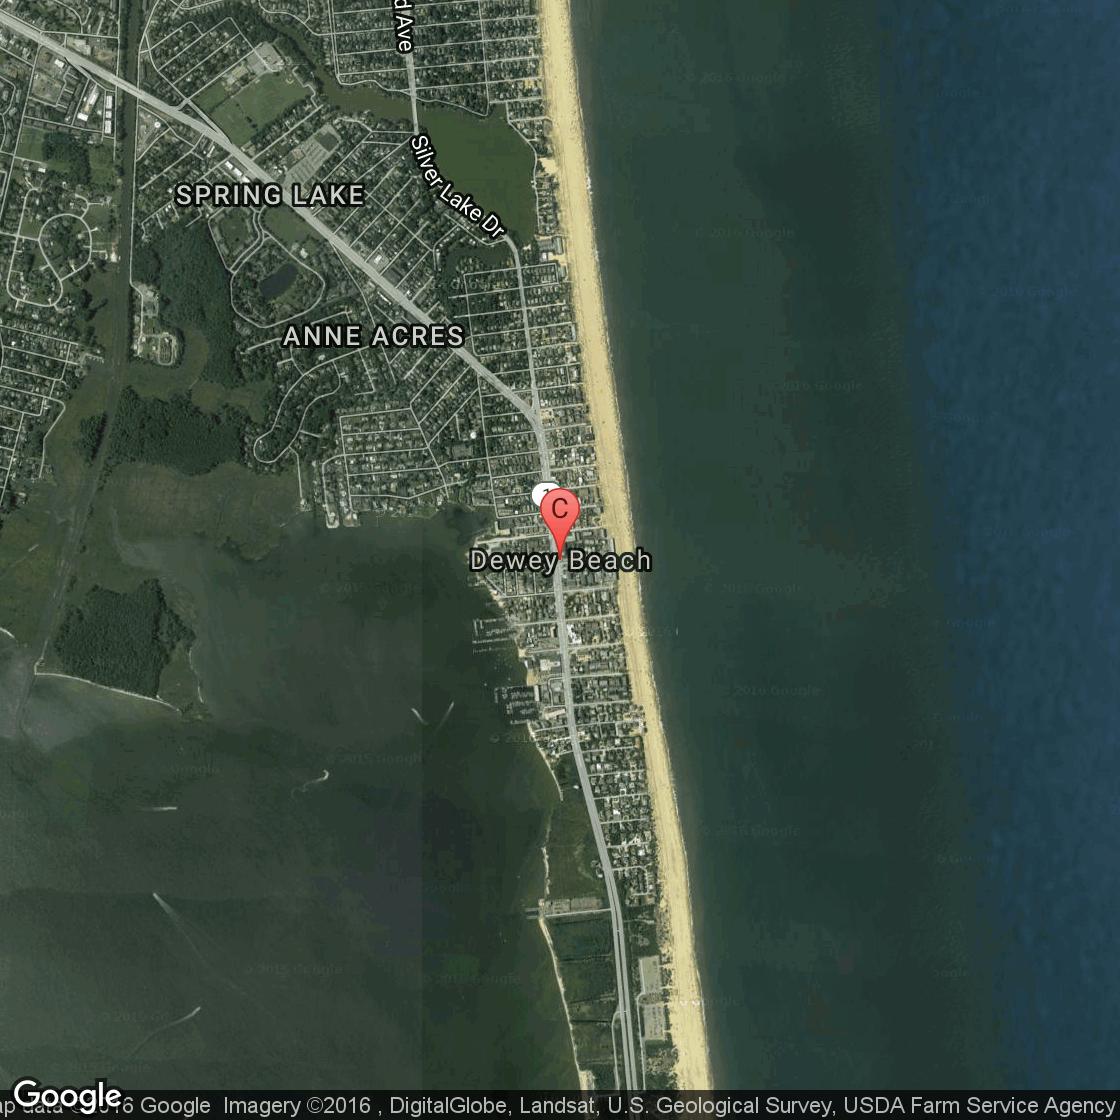 Hotels Near Dewey Beach De